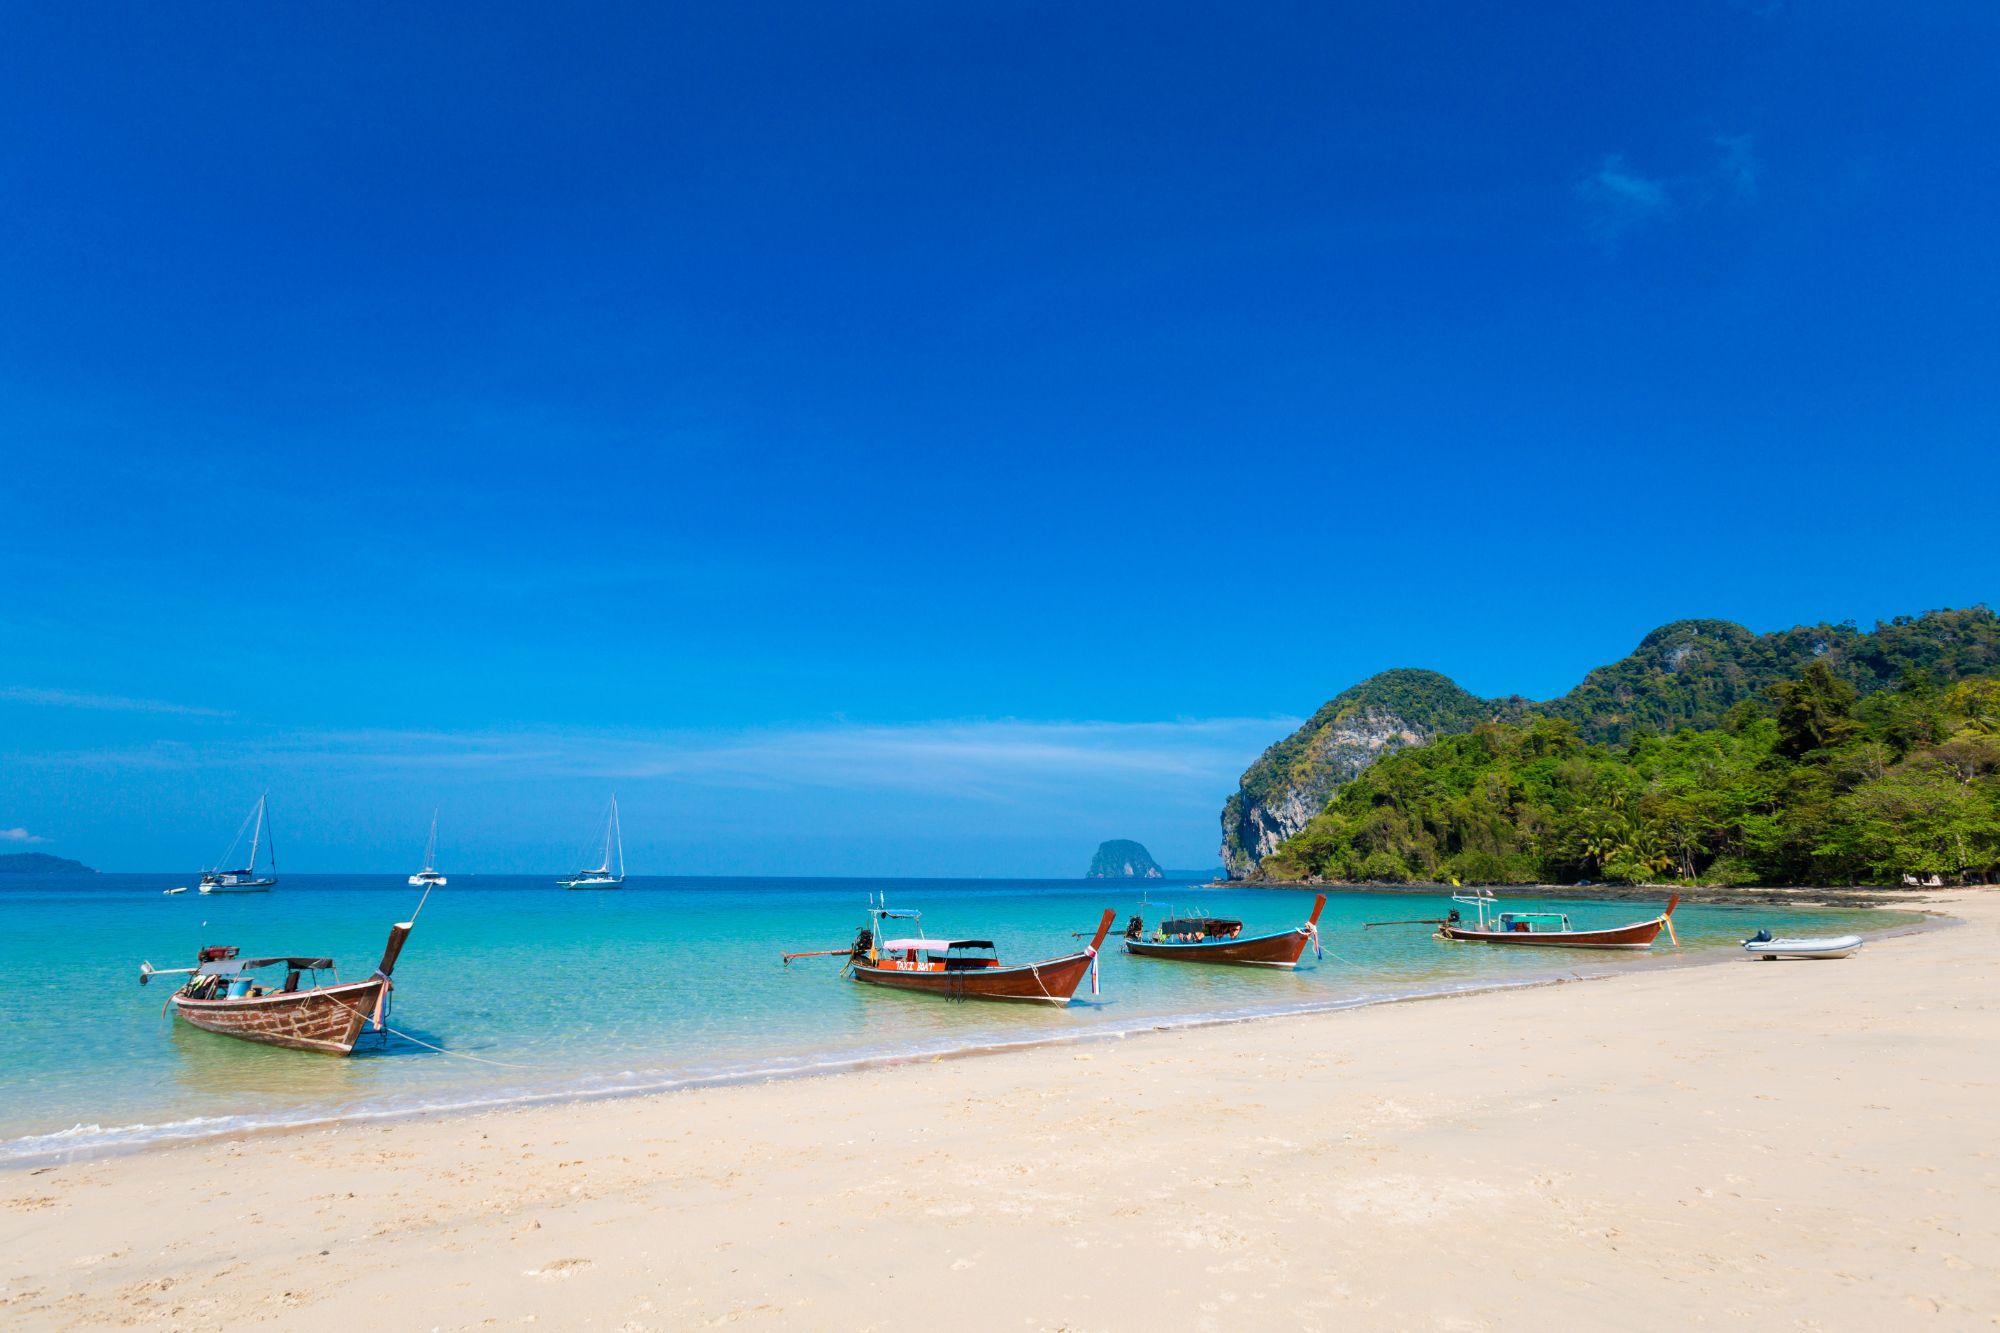 Gerelateerde tour 20-Daagse rondreis Eilandhoppen in de Trang archipel